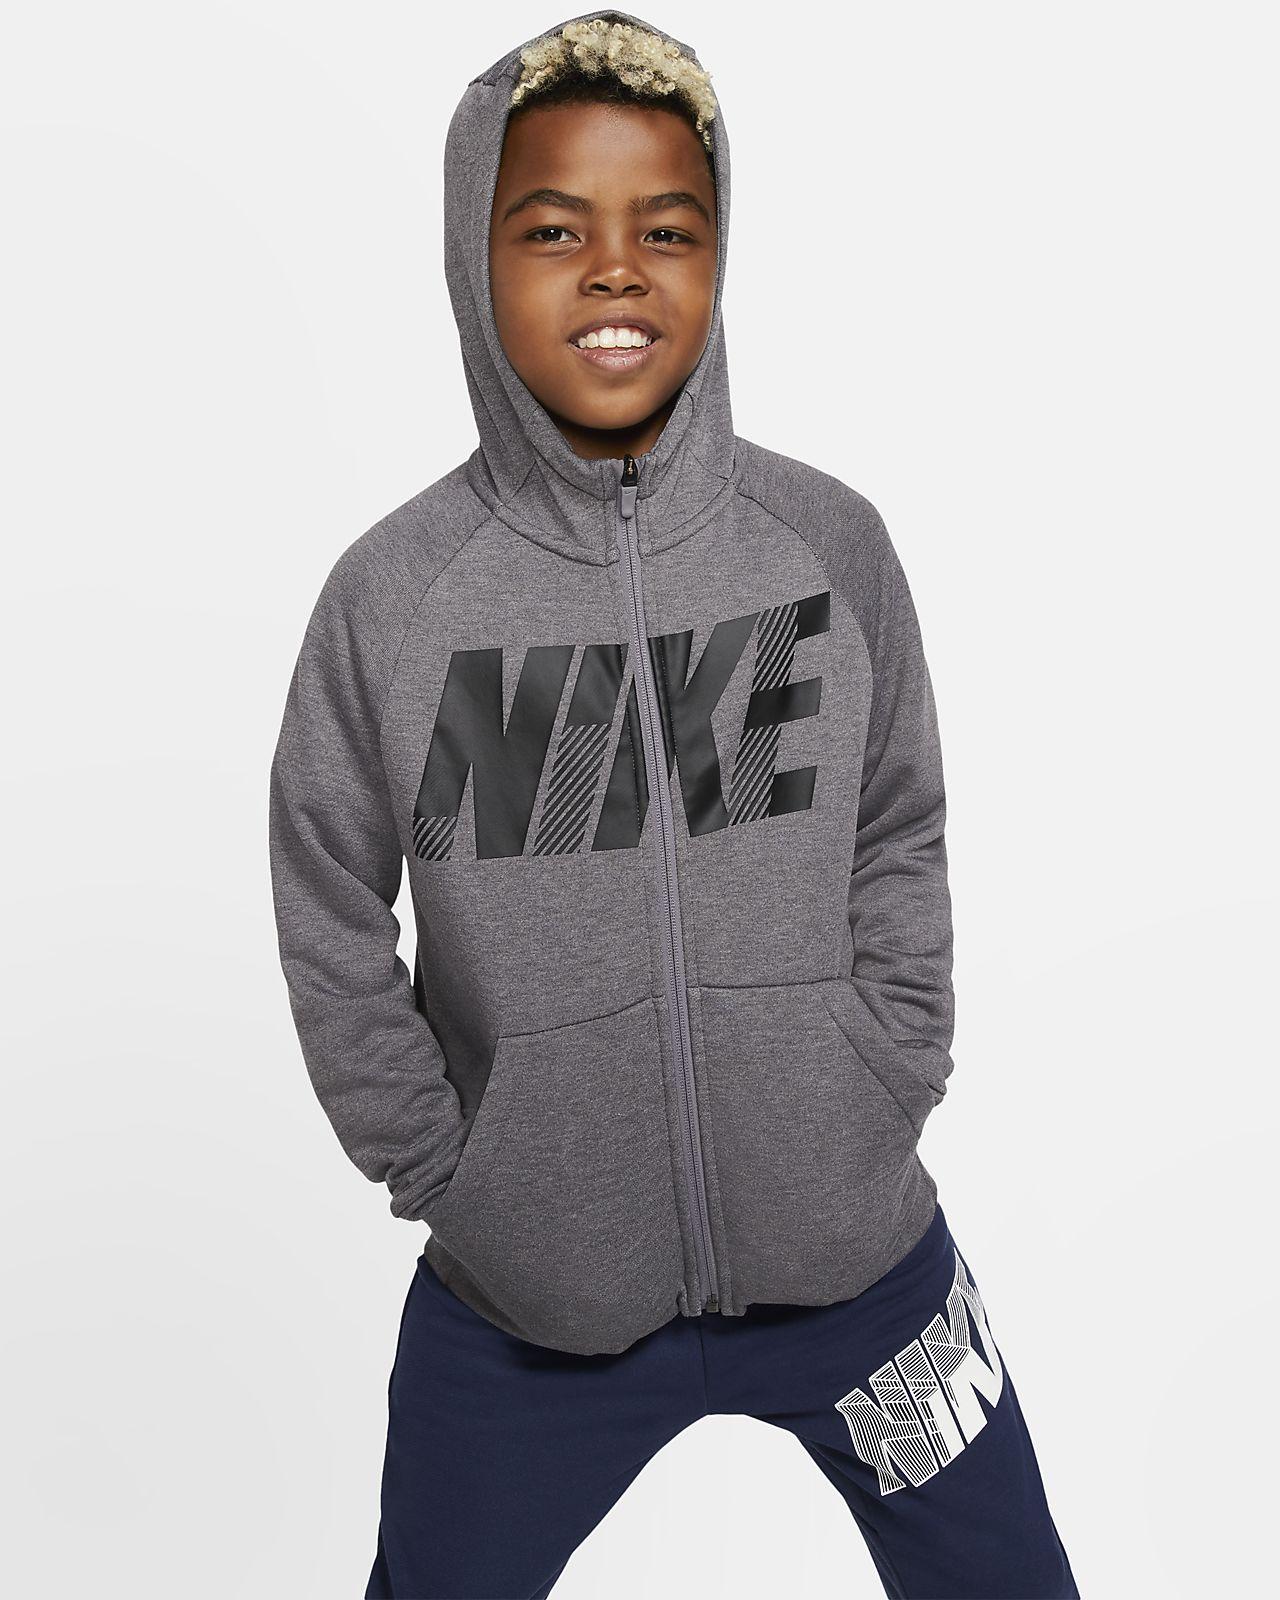 Nike Dri FIT Big Kids' Full Zip Graphic Training Hoodie